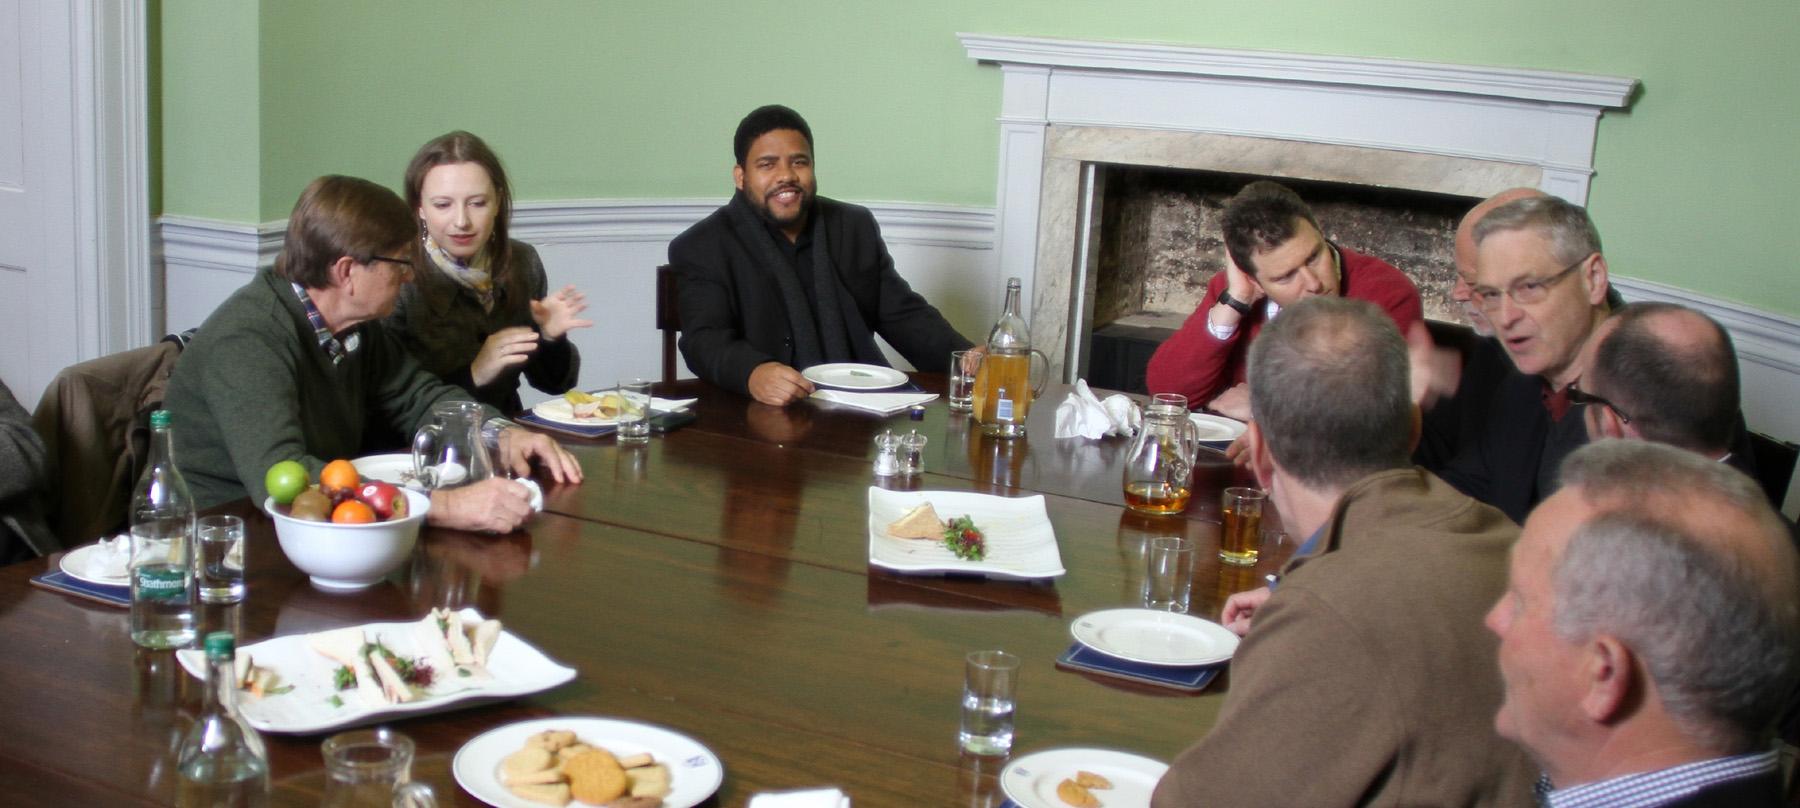 Customer Strategy Network - CRMIC Meeting, Oxford, UK